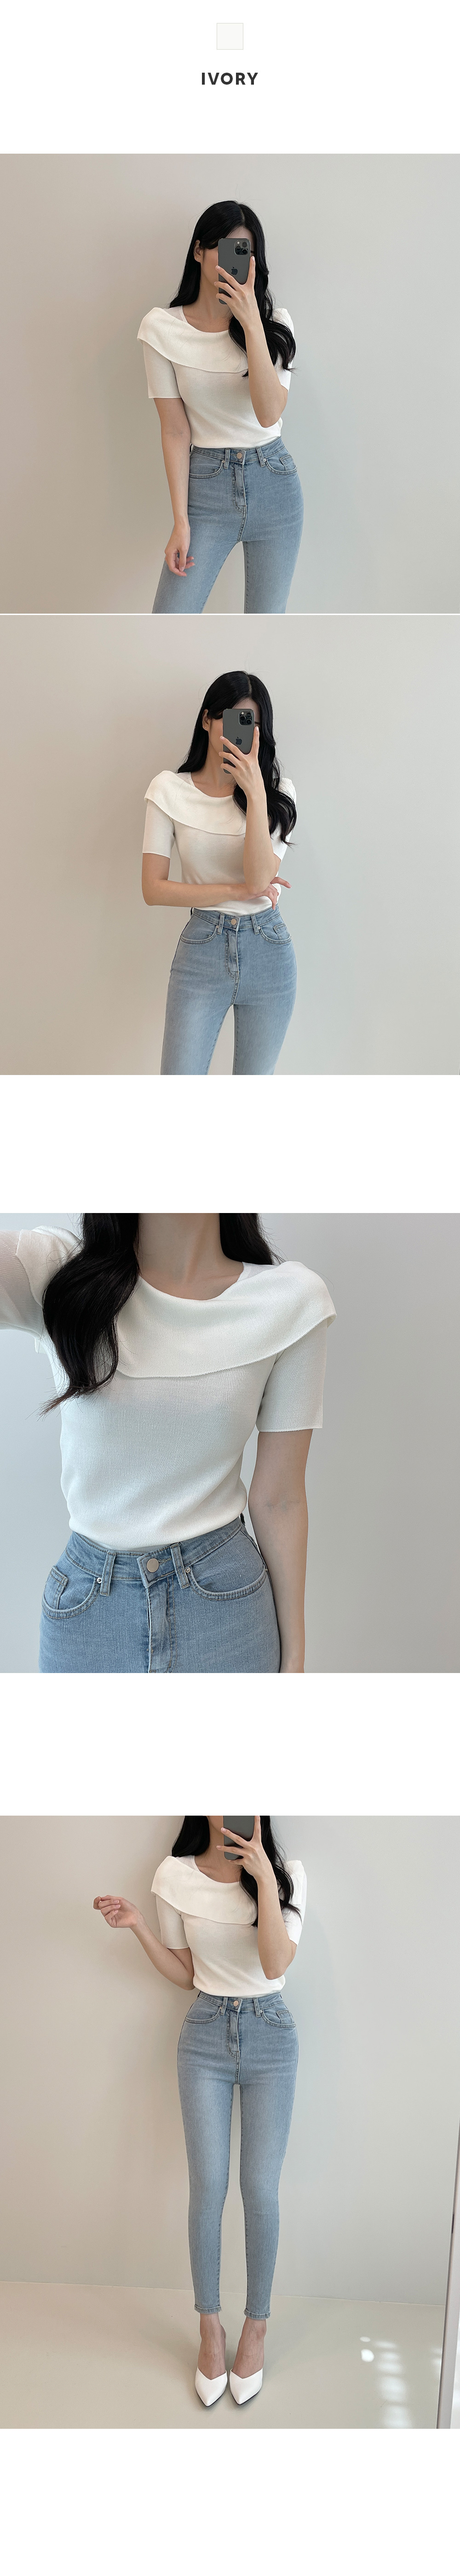 Main, Shoulder Collar Knitwear Short Sleeve T-shirt